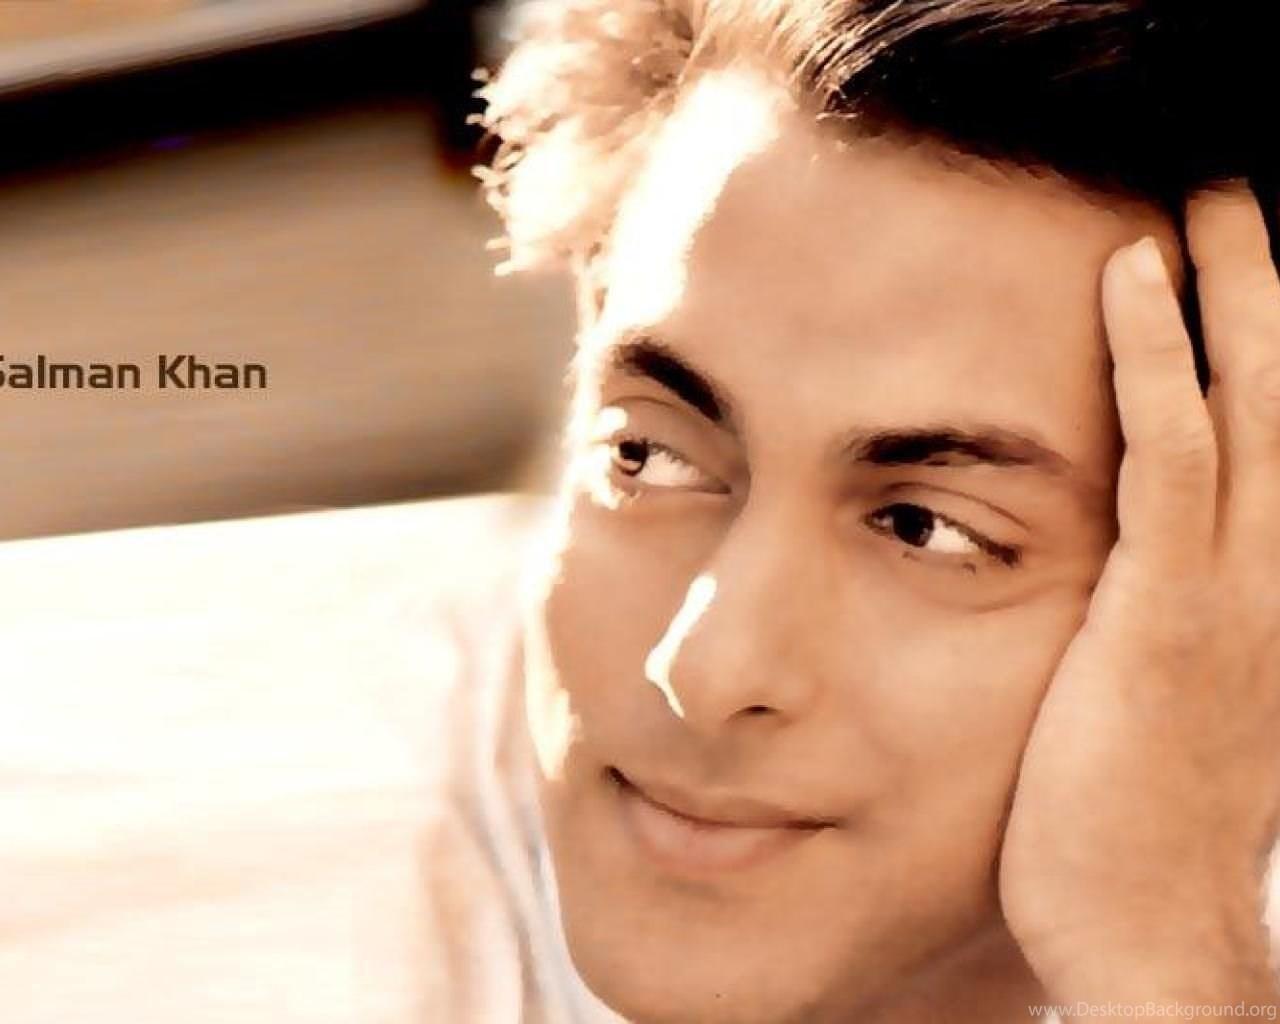 Salman Khan X Vodio Download Com